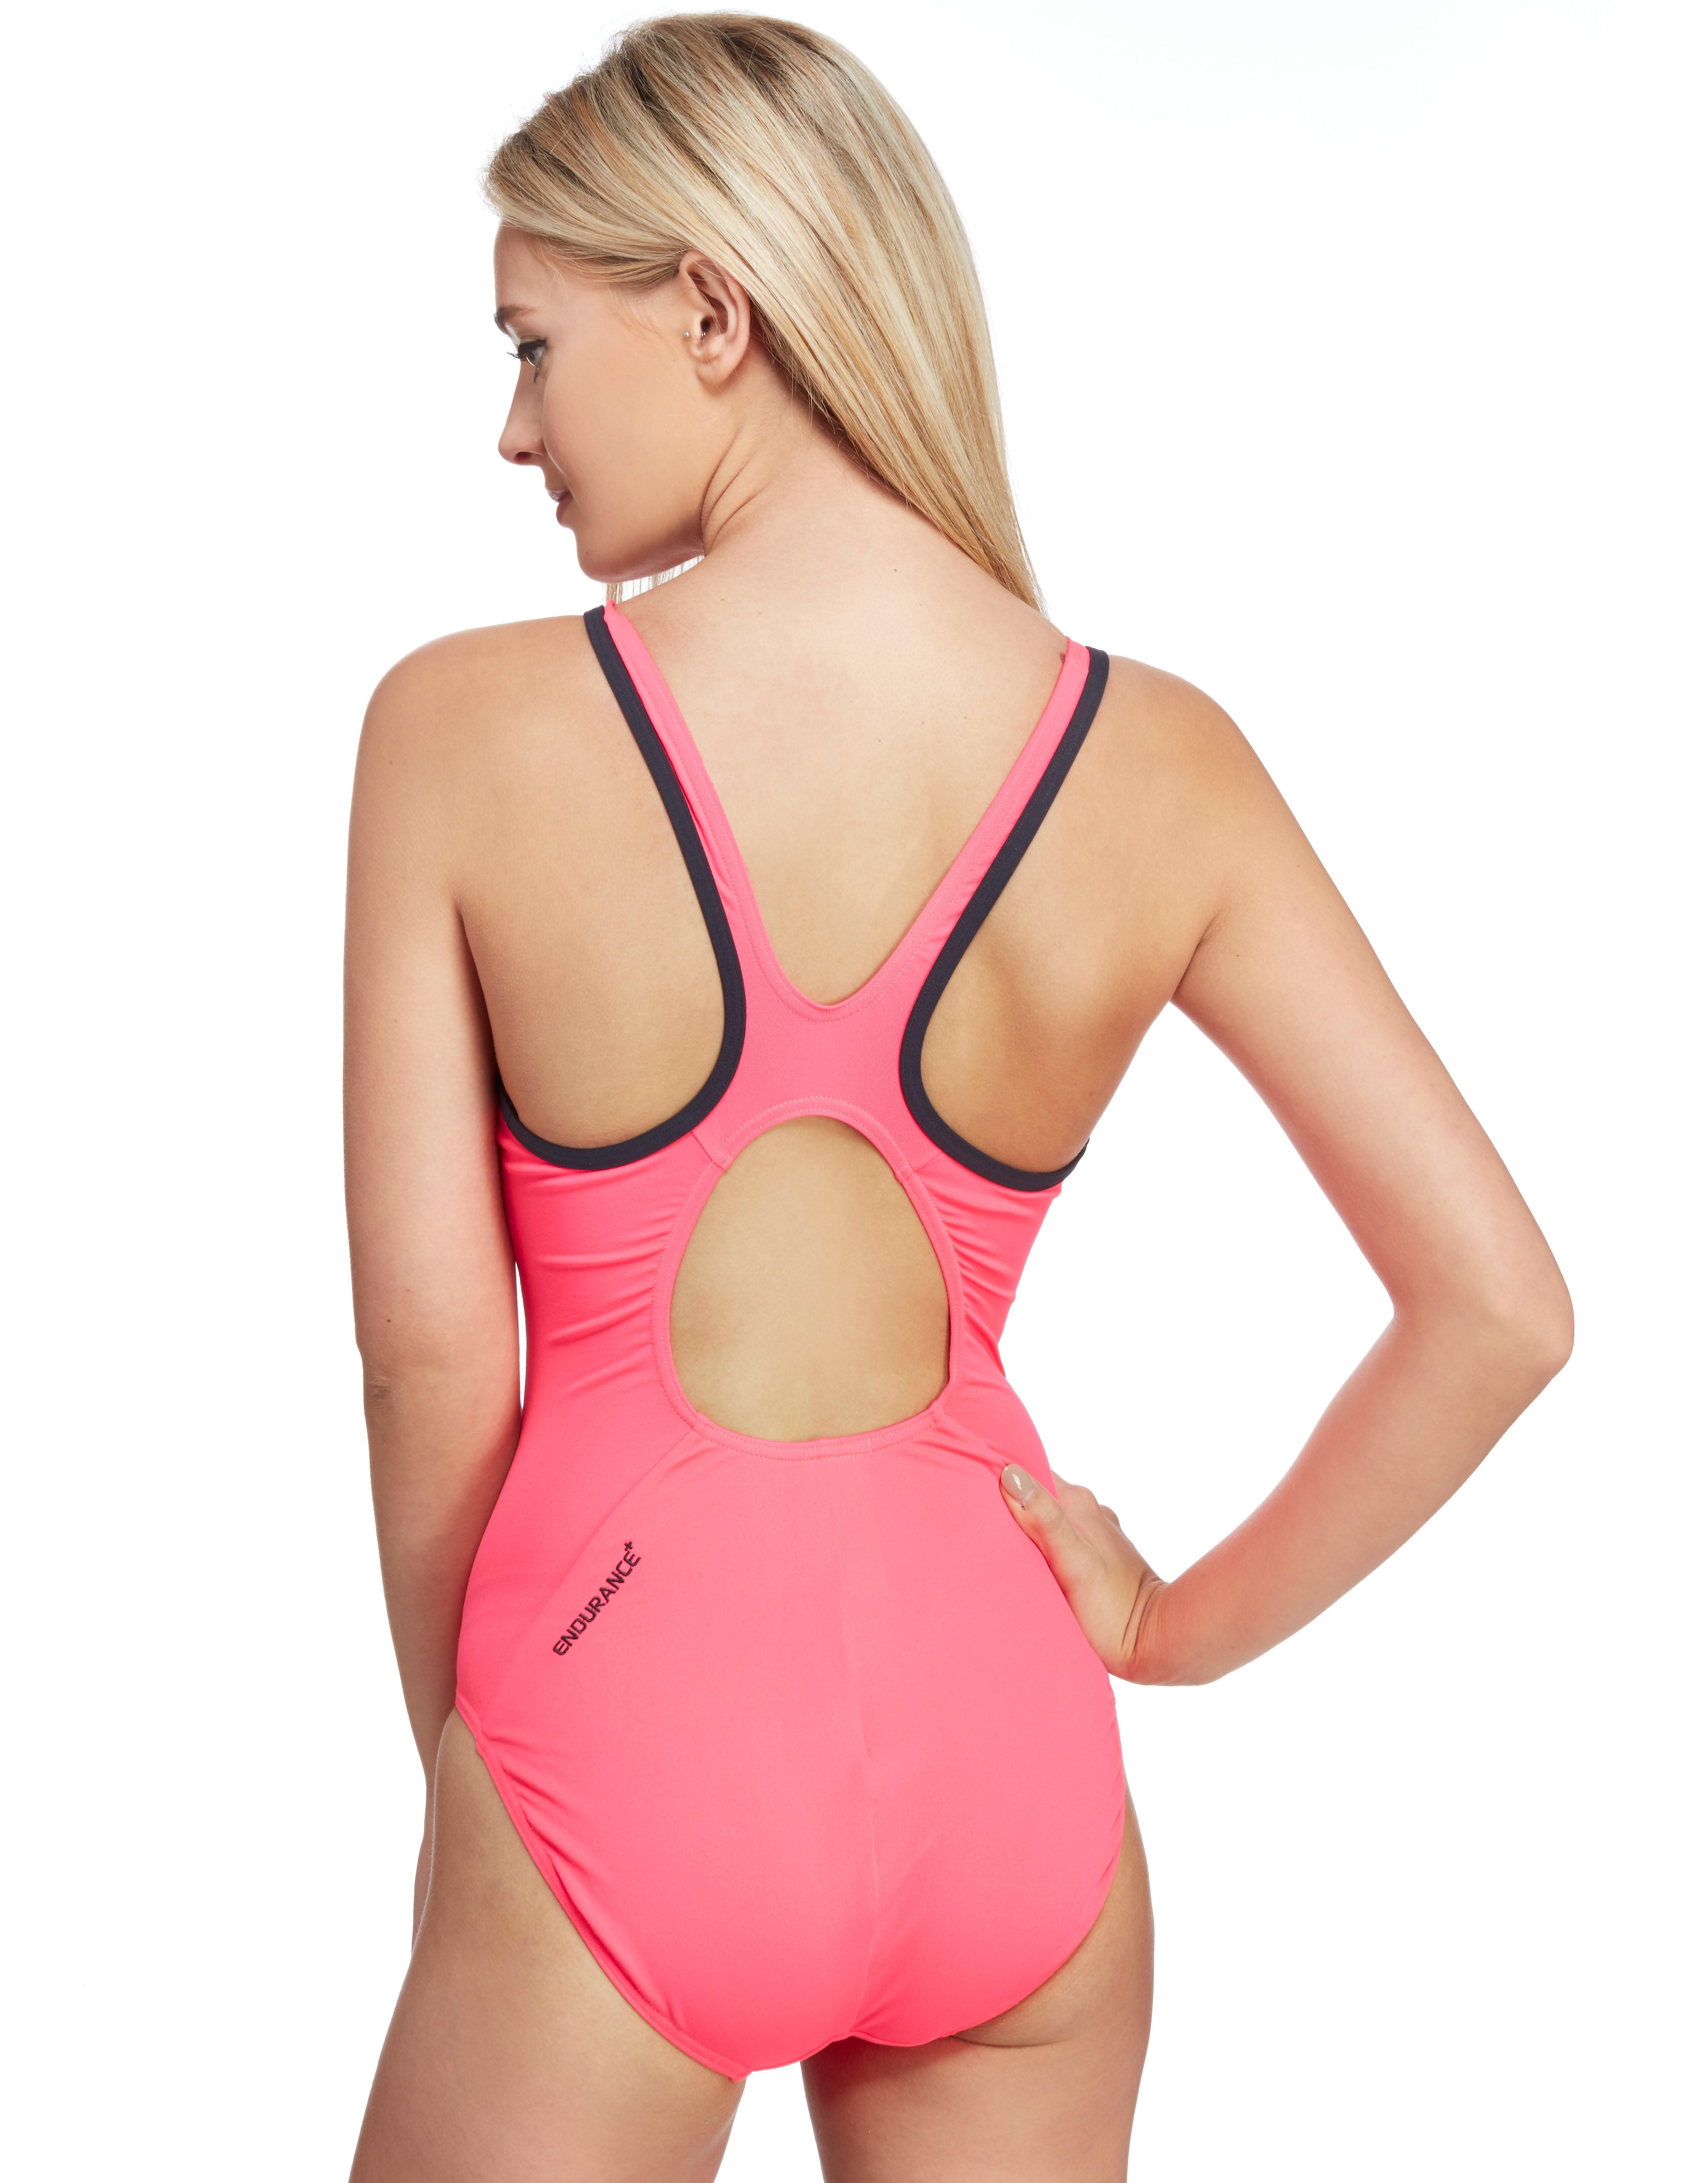 Speedo Monogram Muscleback Swimsuit